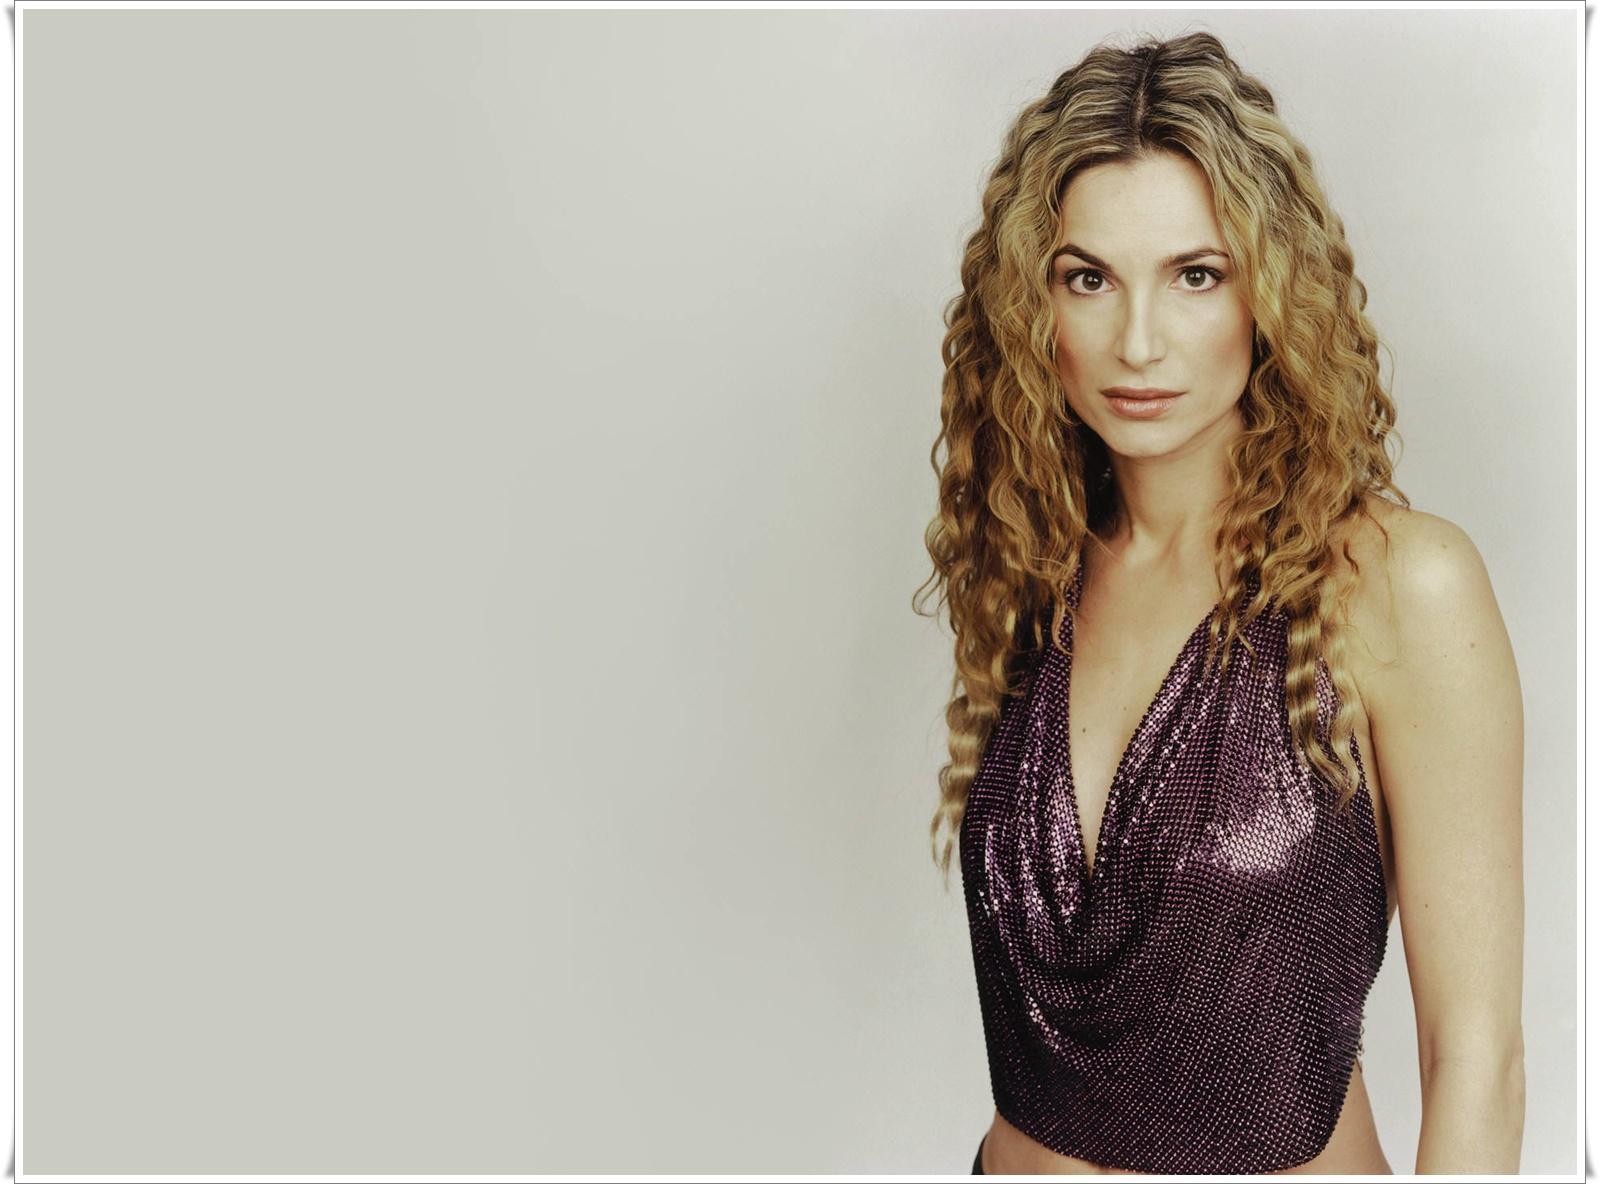 alexandra kamp hollywood hot actress hd wallpapers 2013 | its all